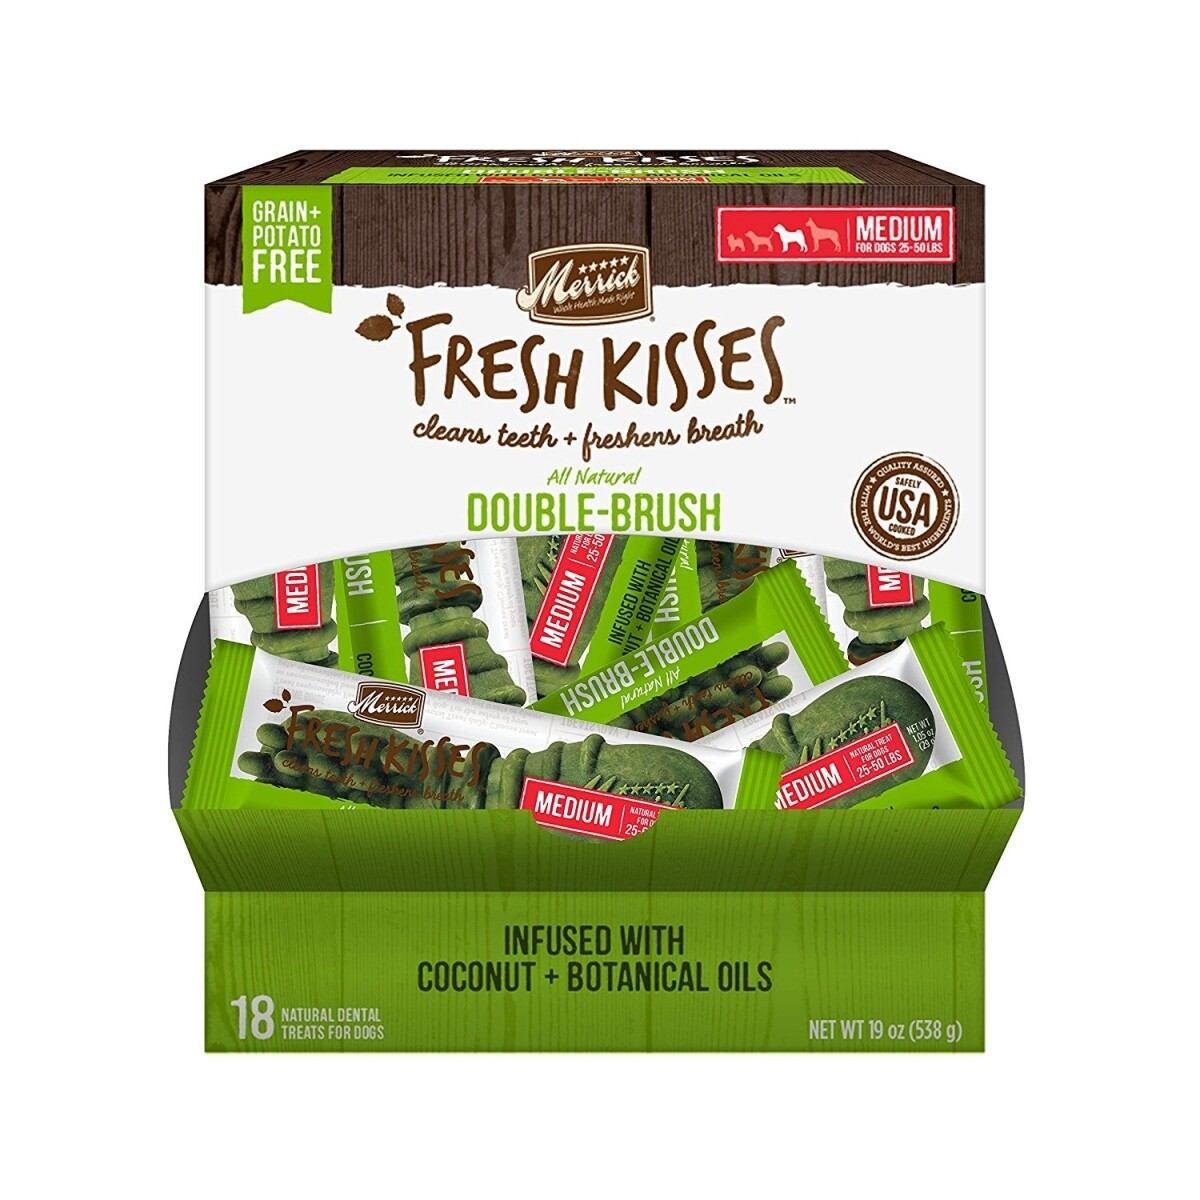 Merrick Fresh Kisses Coconut Oil Extra Small Brush  Dental Dog Treat - 18 Count #66018 (03/19) (A.K5)